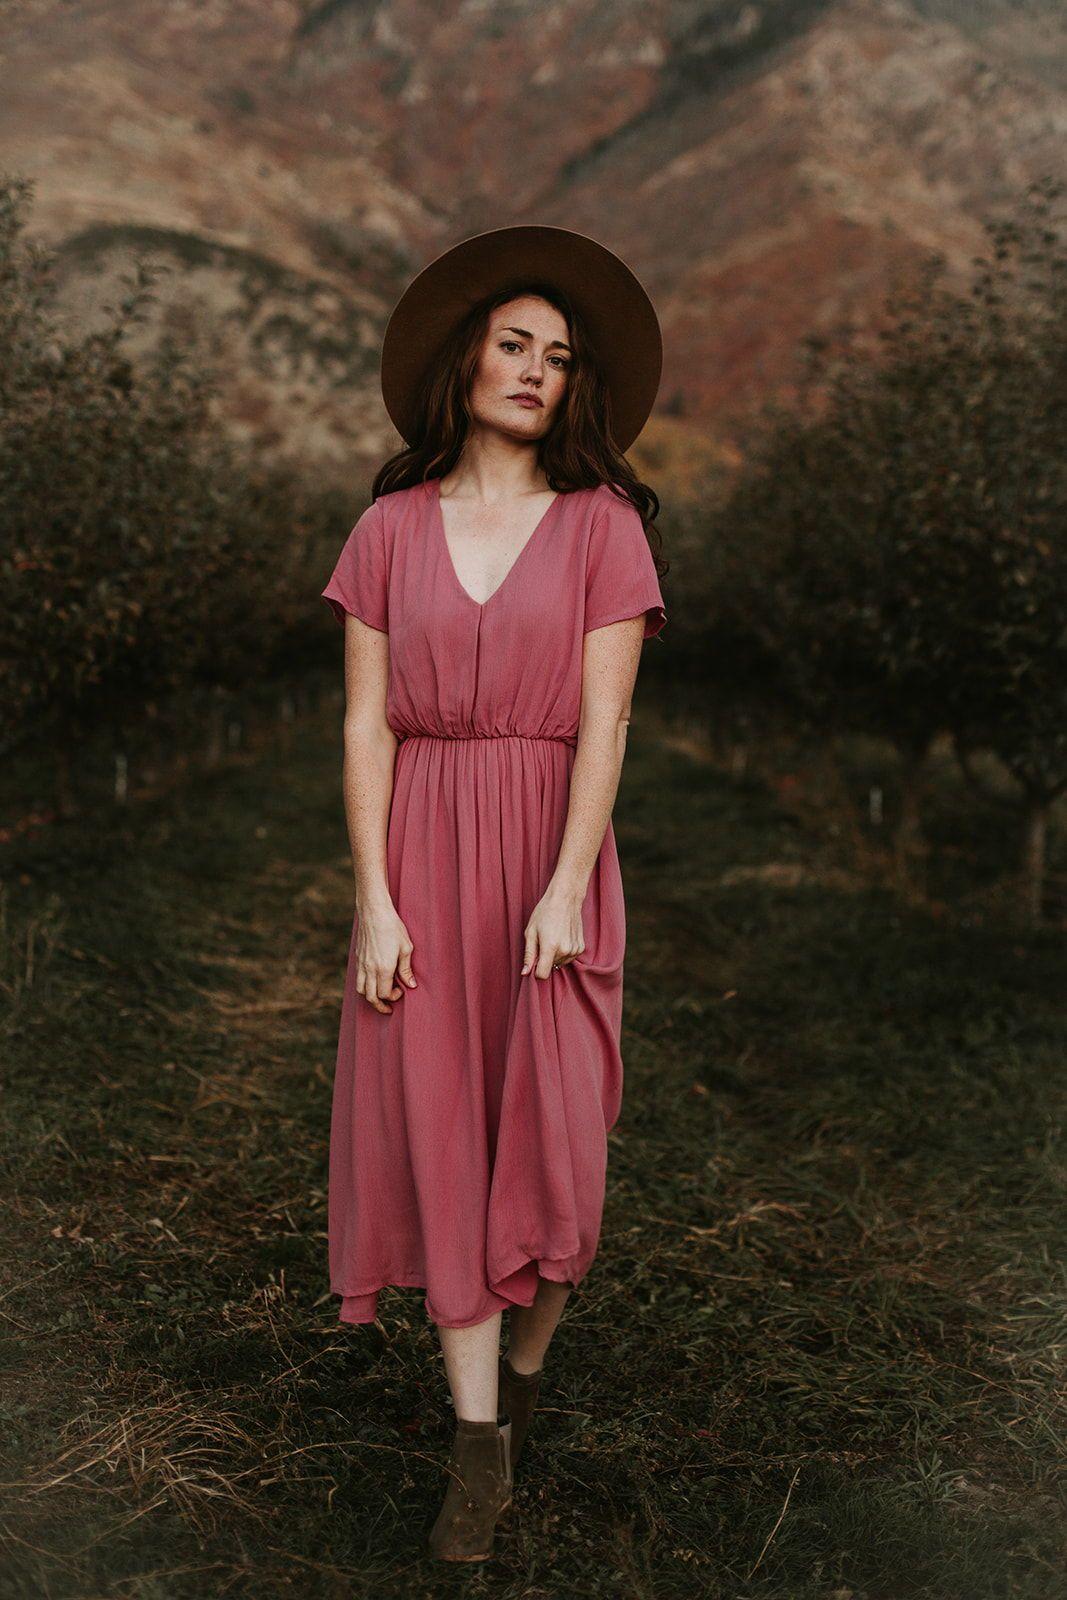 Kentucky Dress - Eggplant | Dresses, Fashion, Cheap dresses